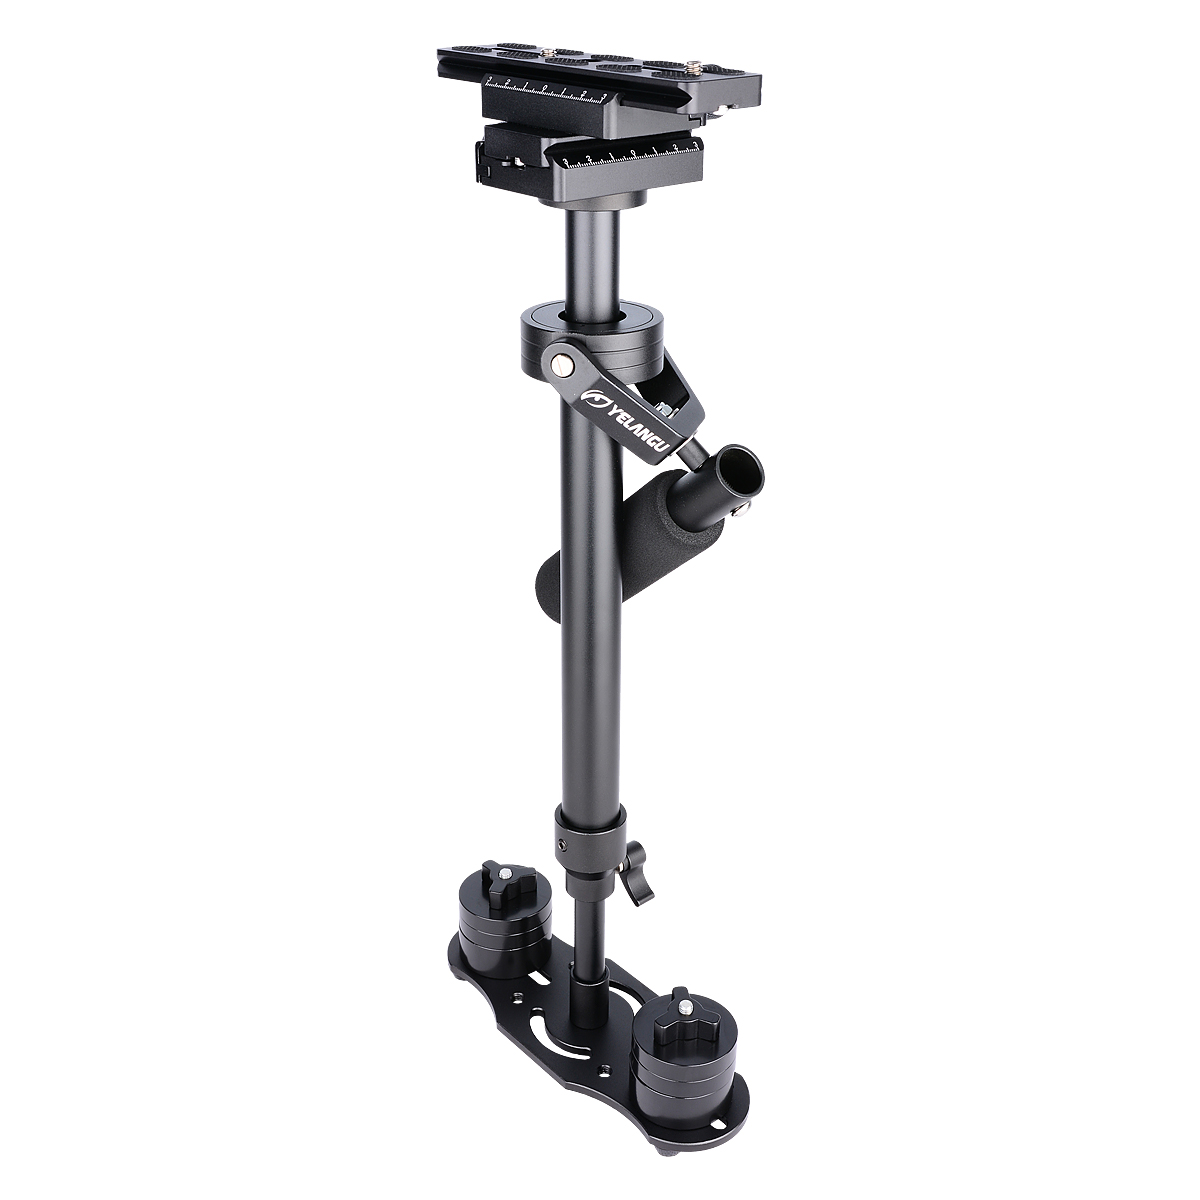 YELANGU-S60N-Handheld-Steady-Stabilizer-360-For-DSLR-Canon-Camera thumbnail 2